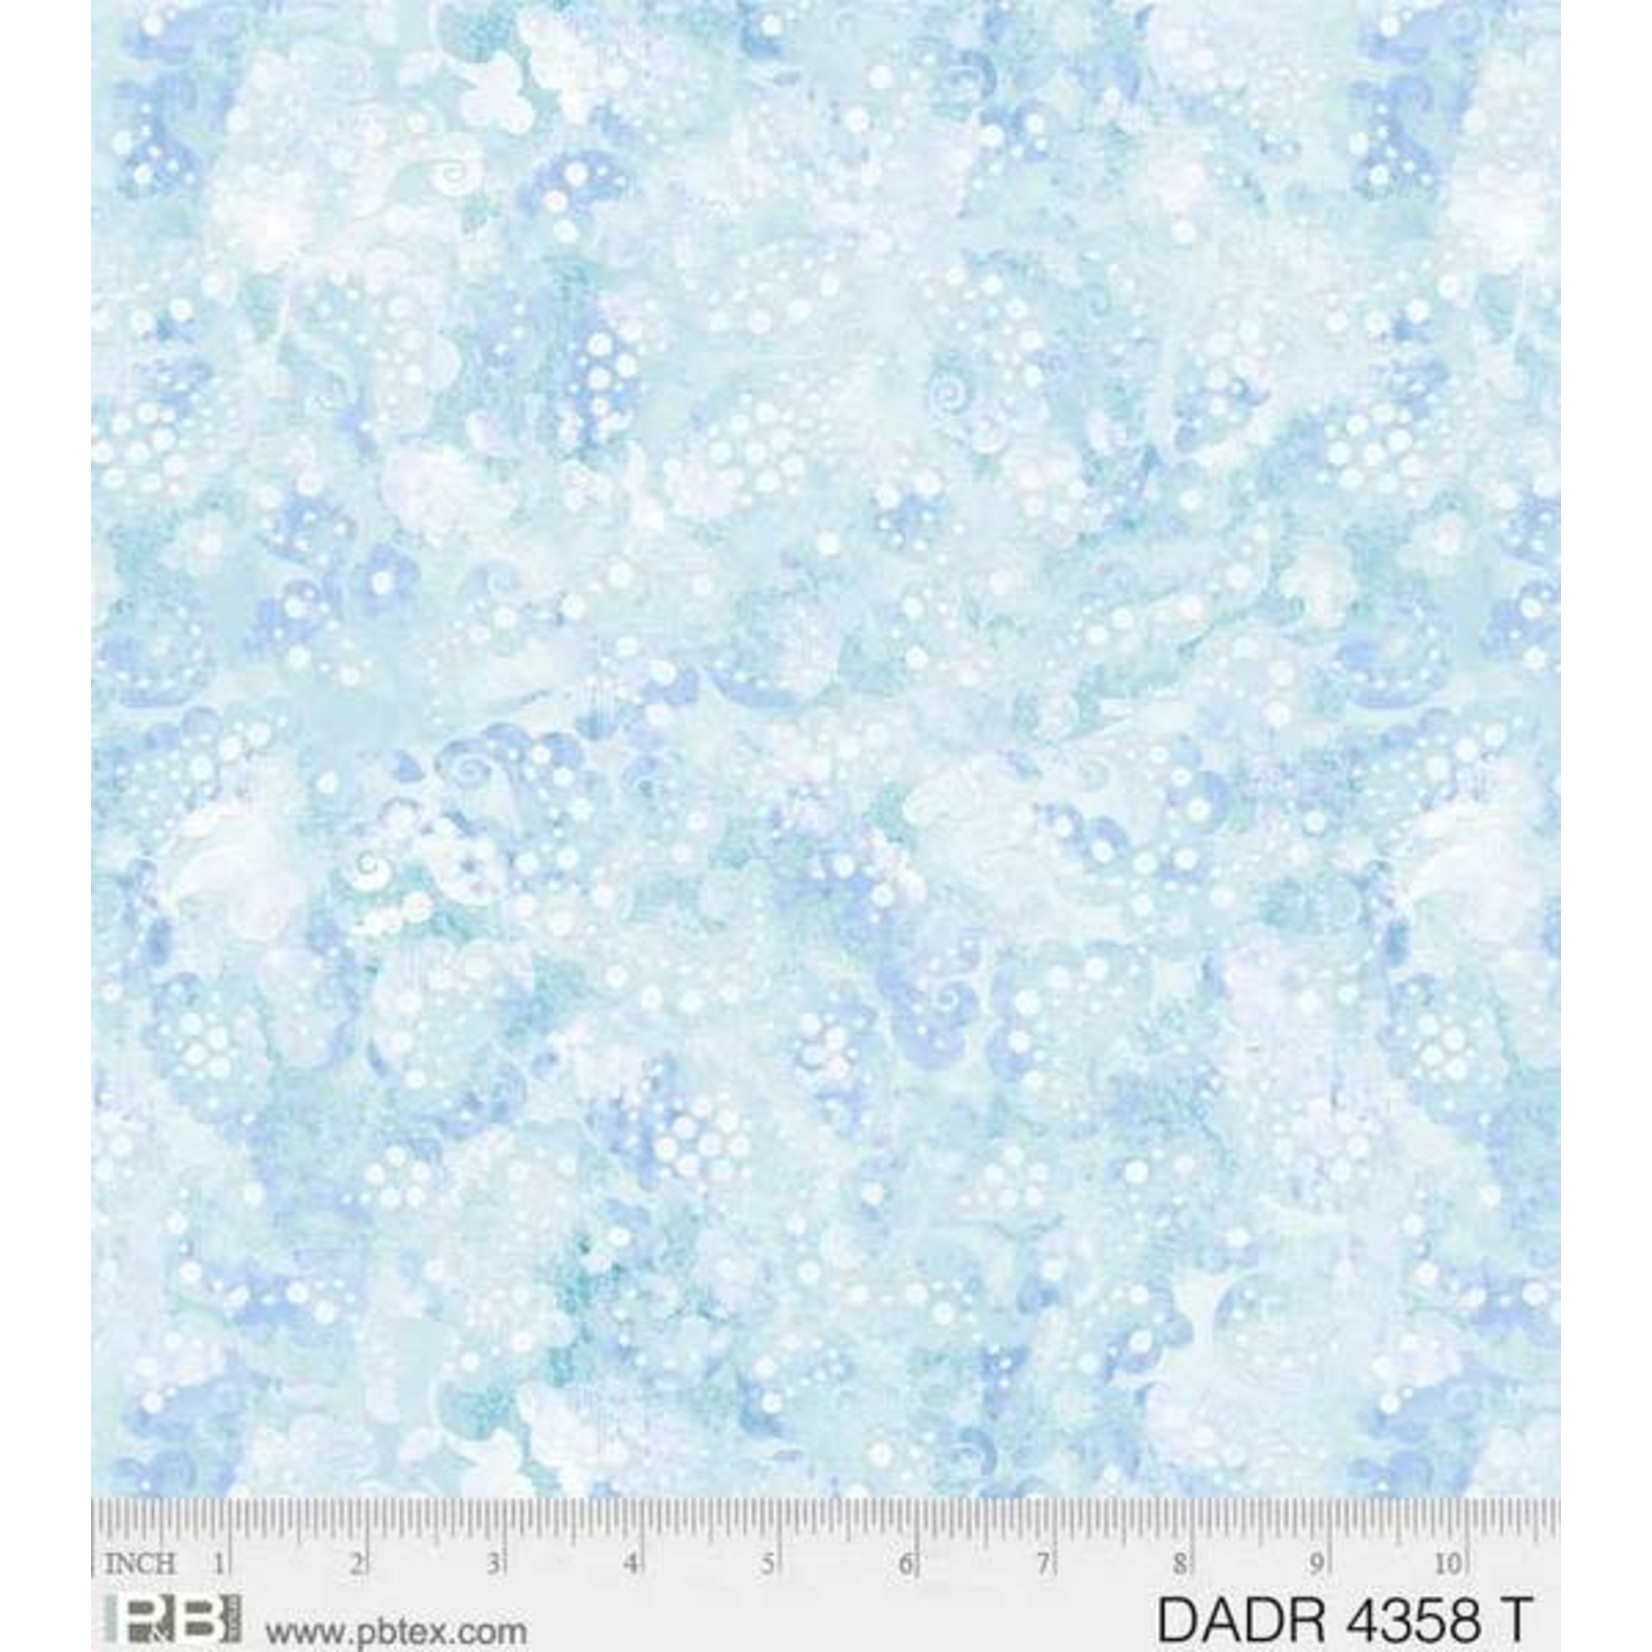 P&B Textiles Day Dream - Light Blue